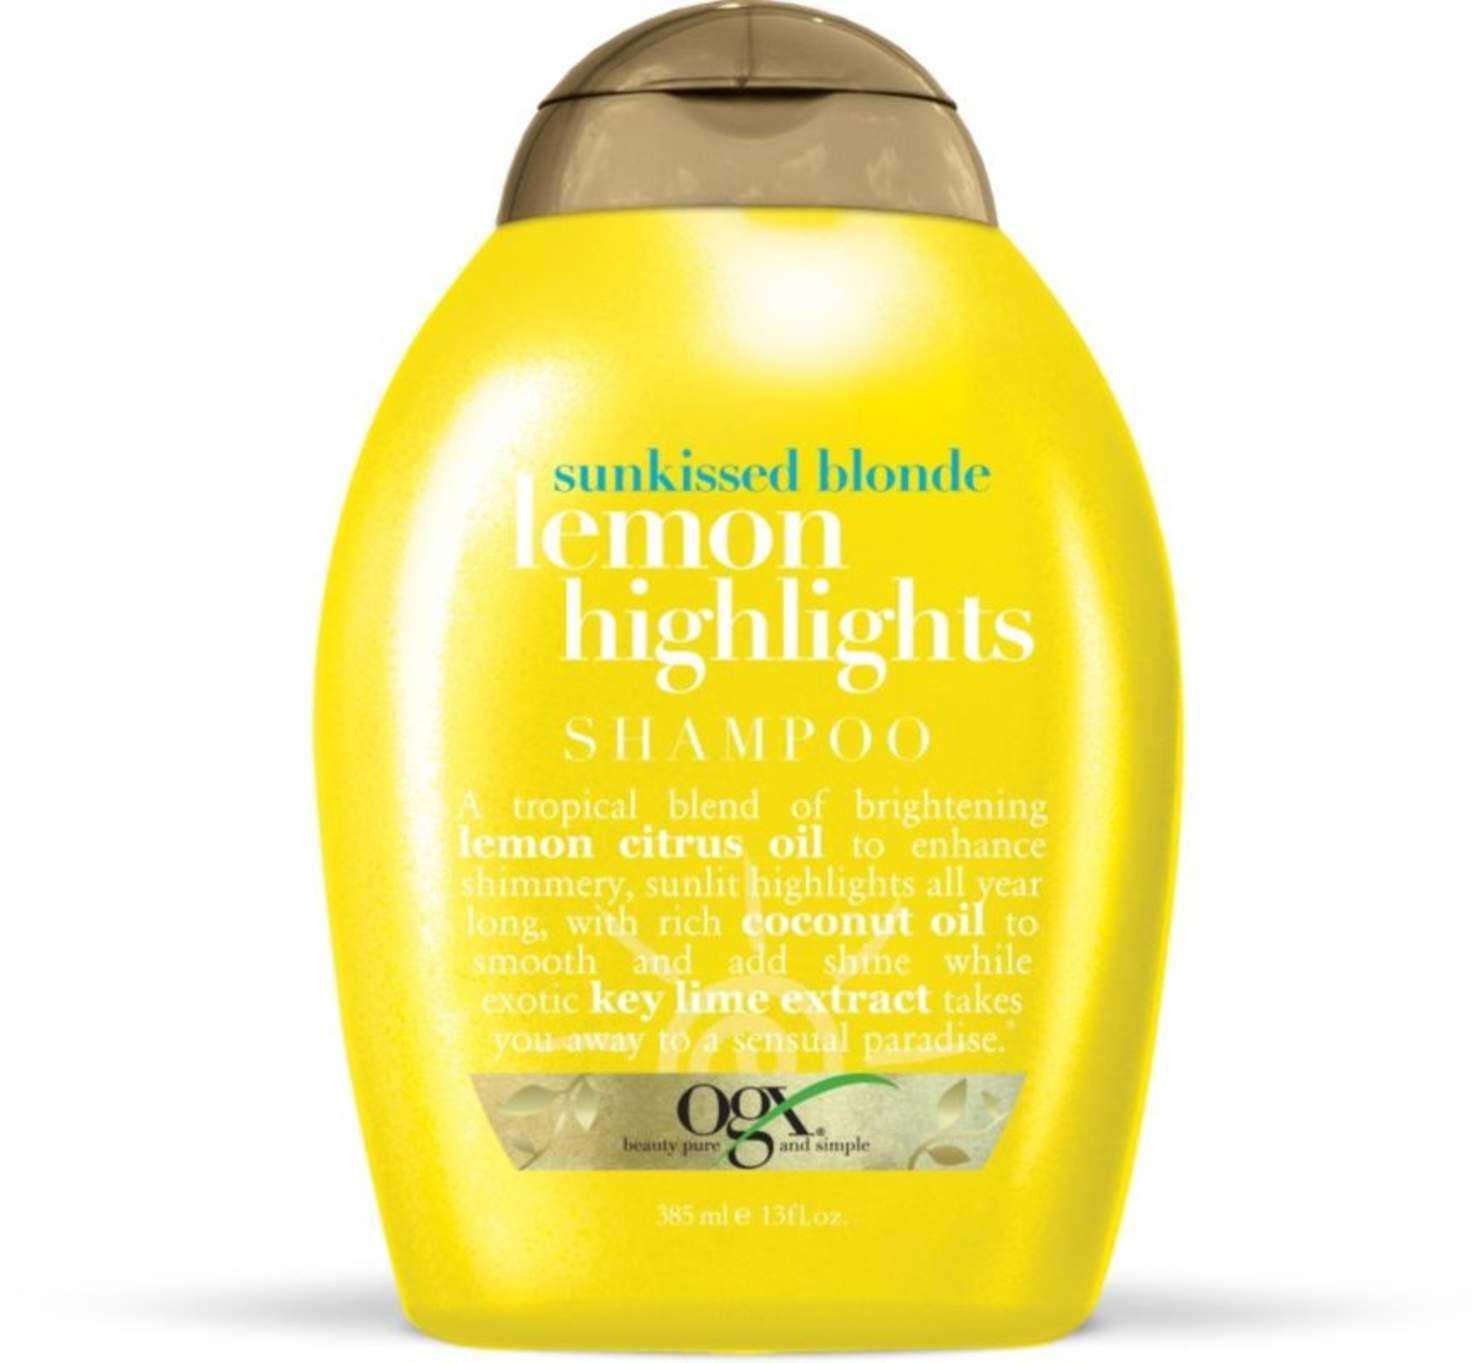 Sunkissed Blonde Lemon Highlights Shampoo With Images Lemon